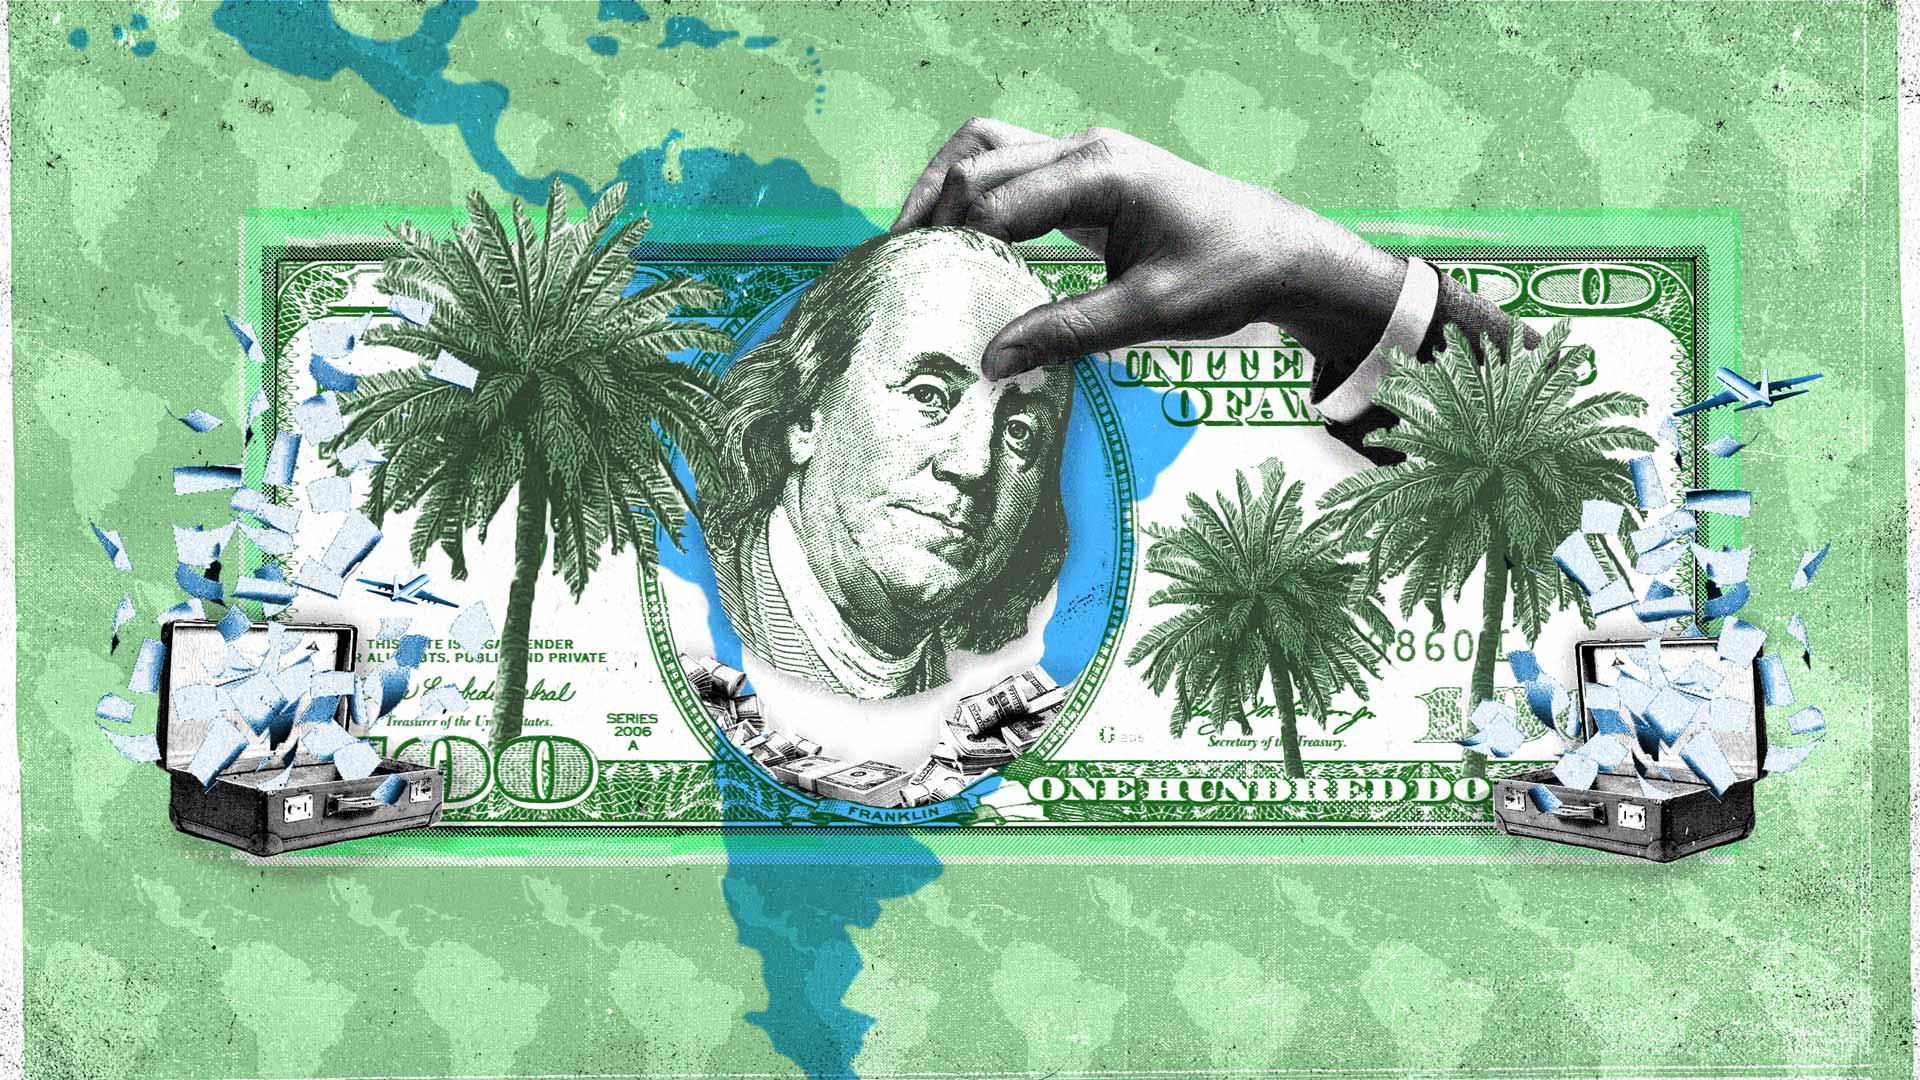 De Panamá a Pandora Papers: ¿a quién le importa? - Revista Anfibia